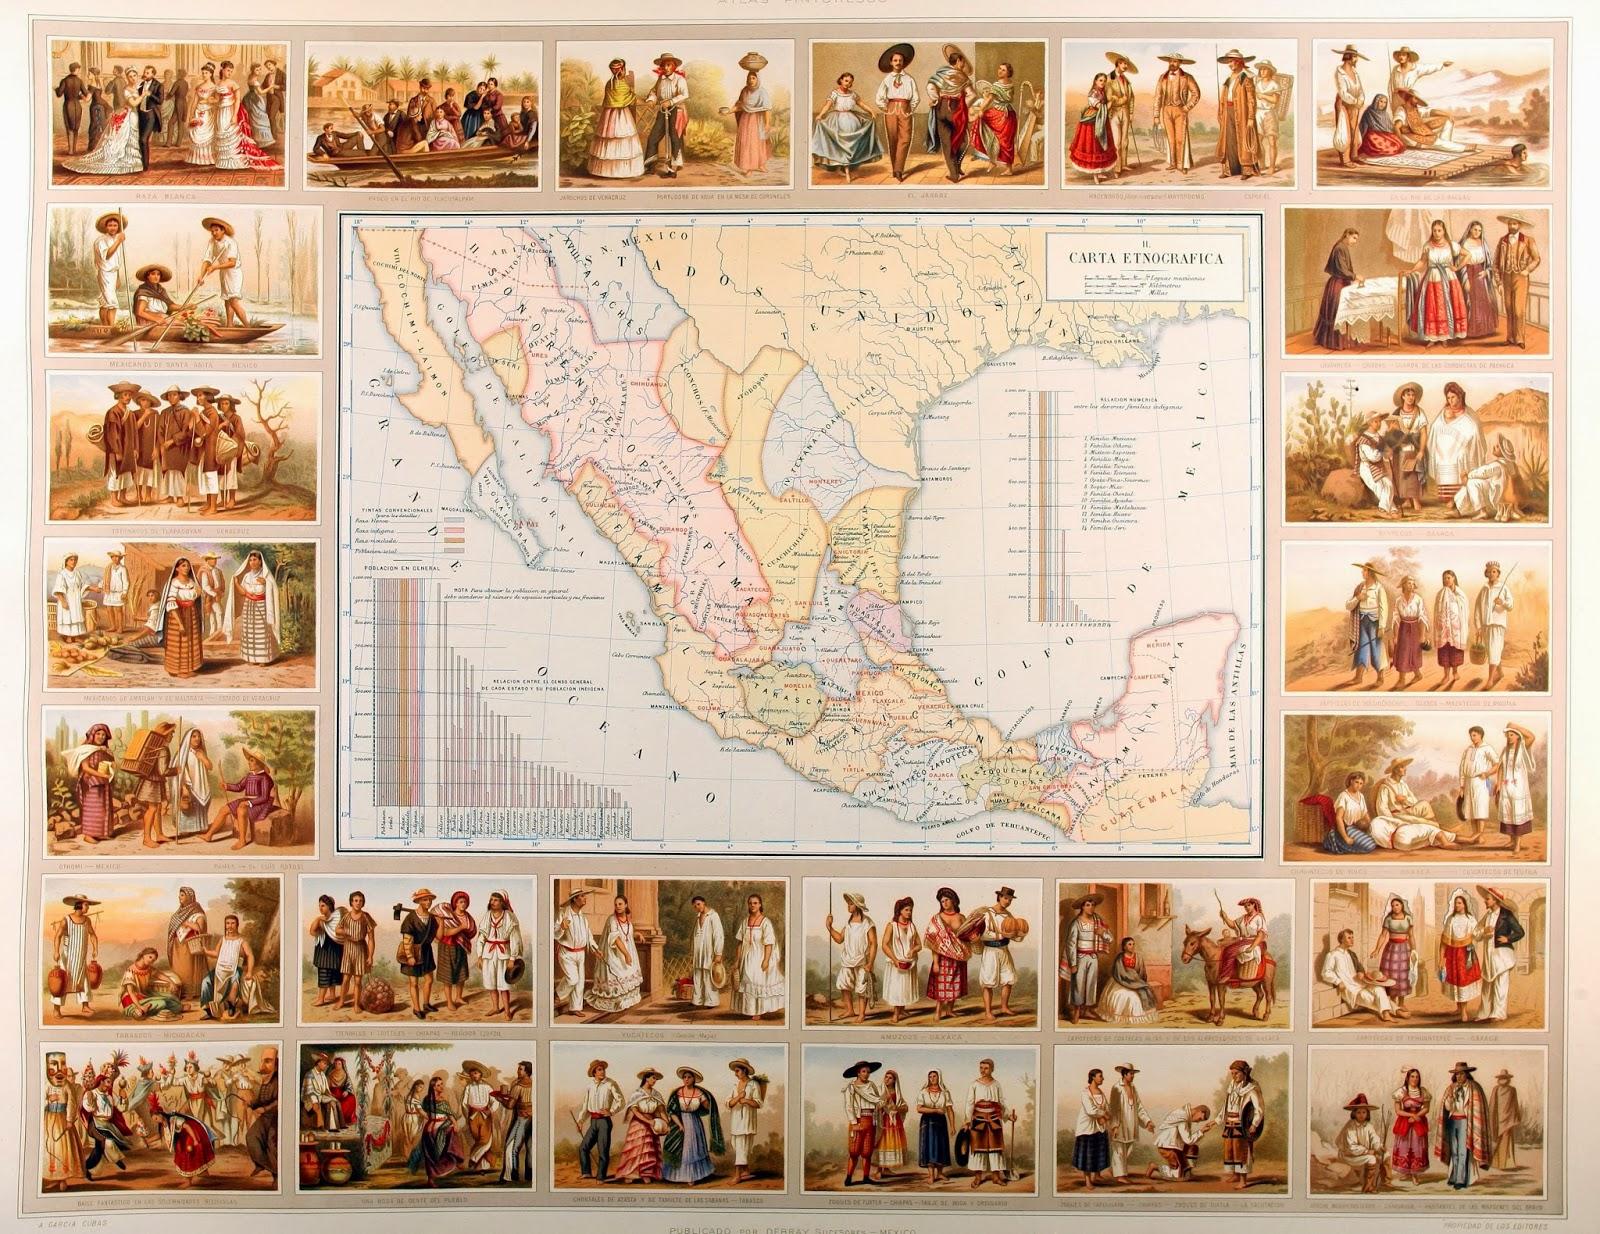 El mito del mestizaje de la raza mexicana